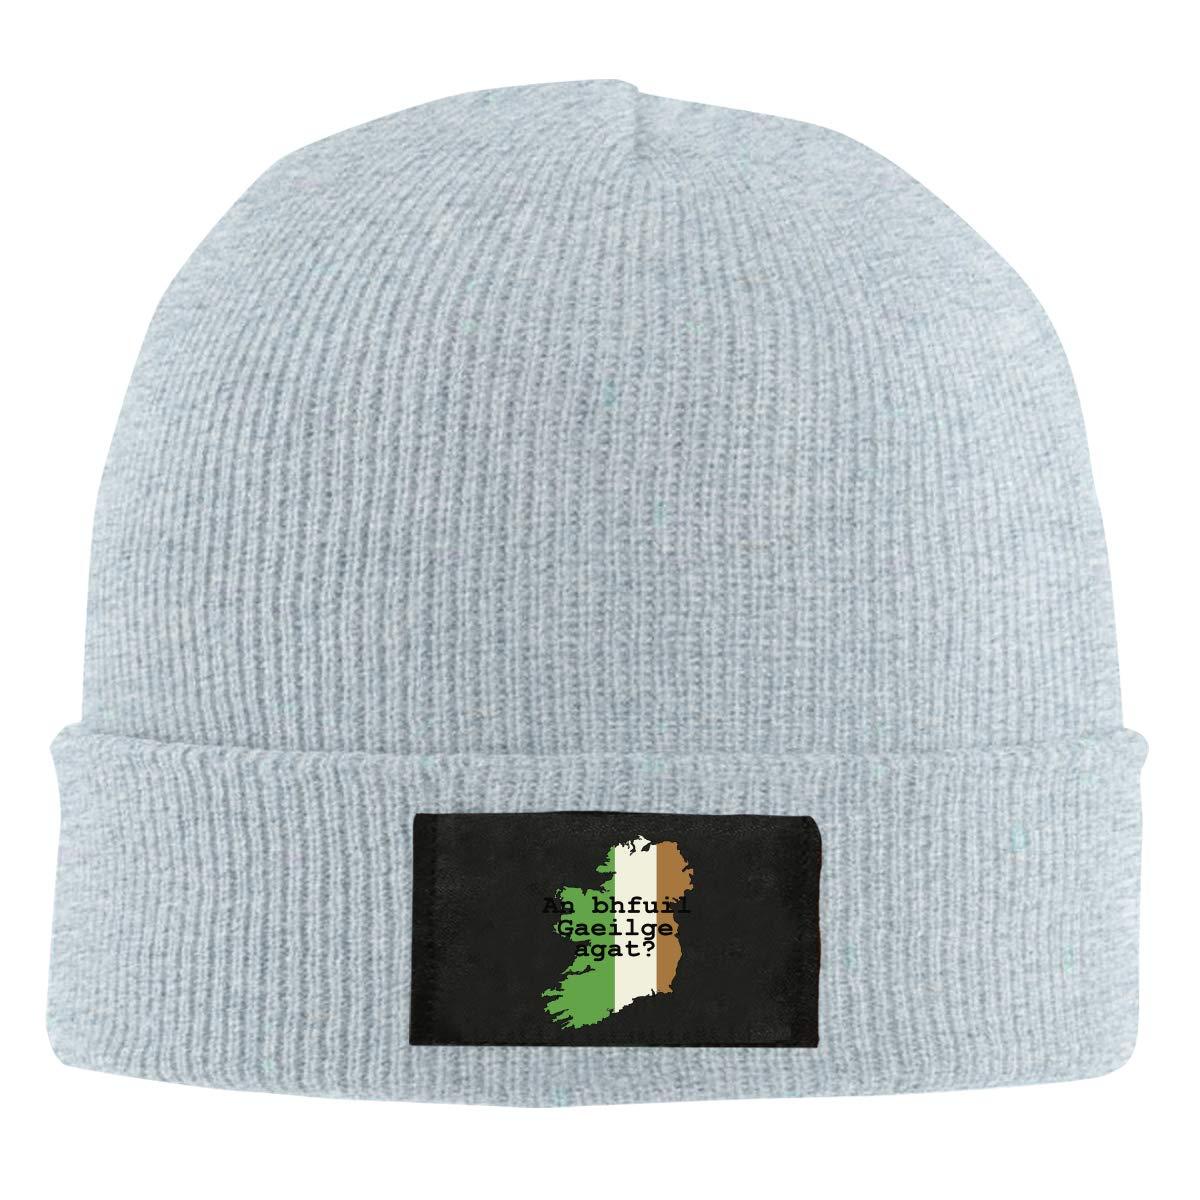 ASDGEGASFAS Unisex Do You Speak Irish Skull Cap Knit Wool Beanie Hat Stretchy Solid Daily Wear